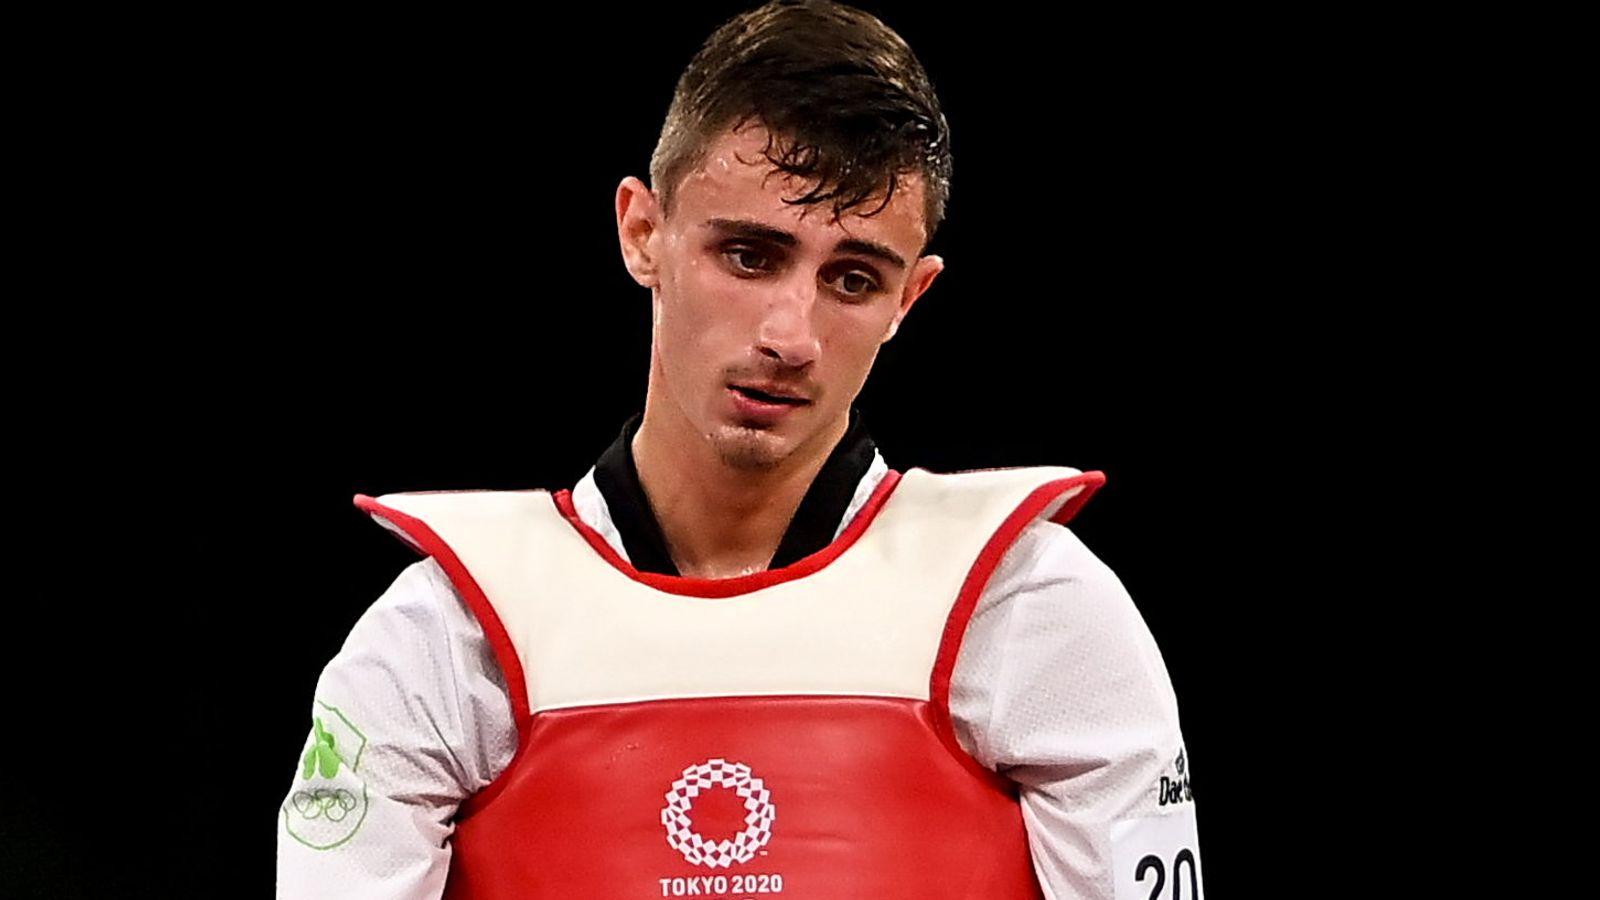 Taekwondoín olímpico sufrió brutal ataque en el rostro en Dublín